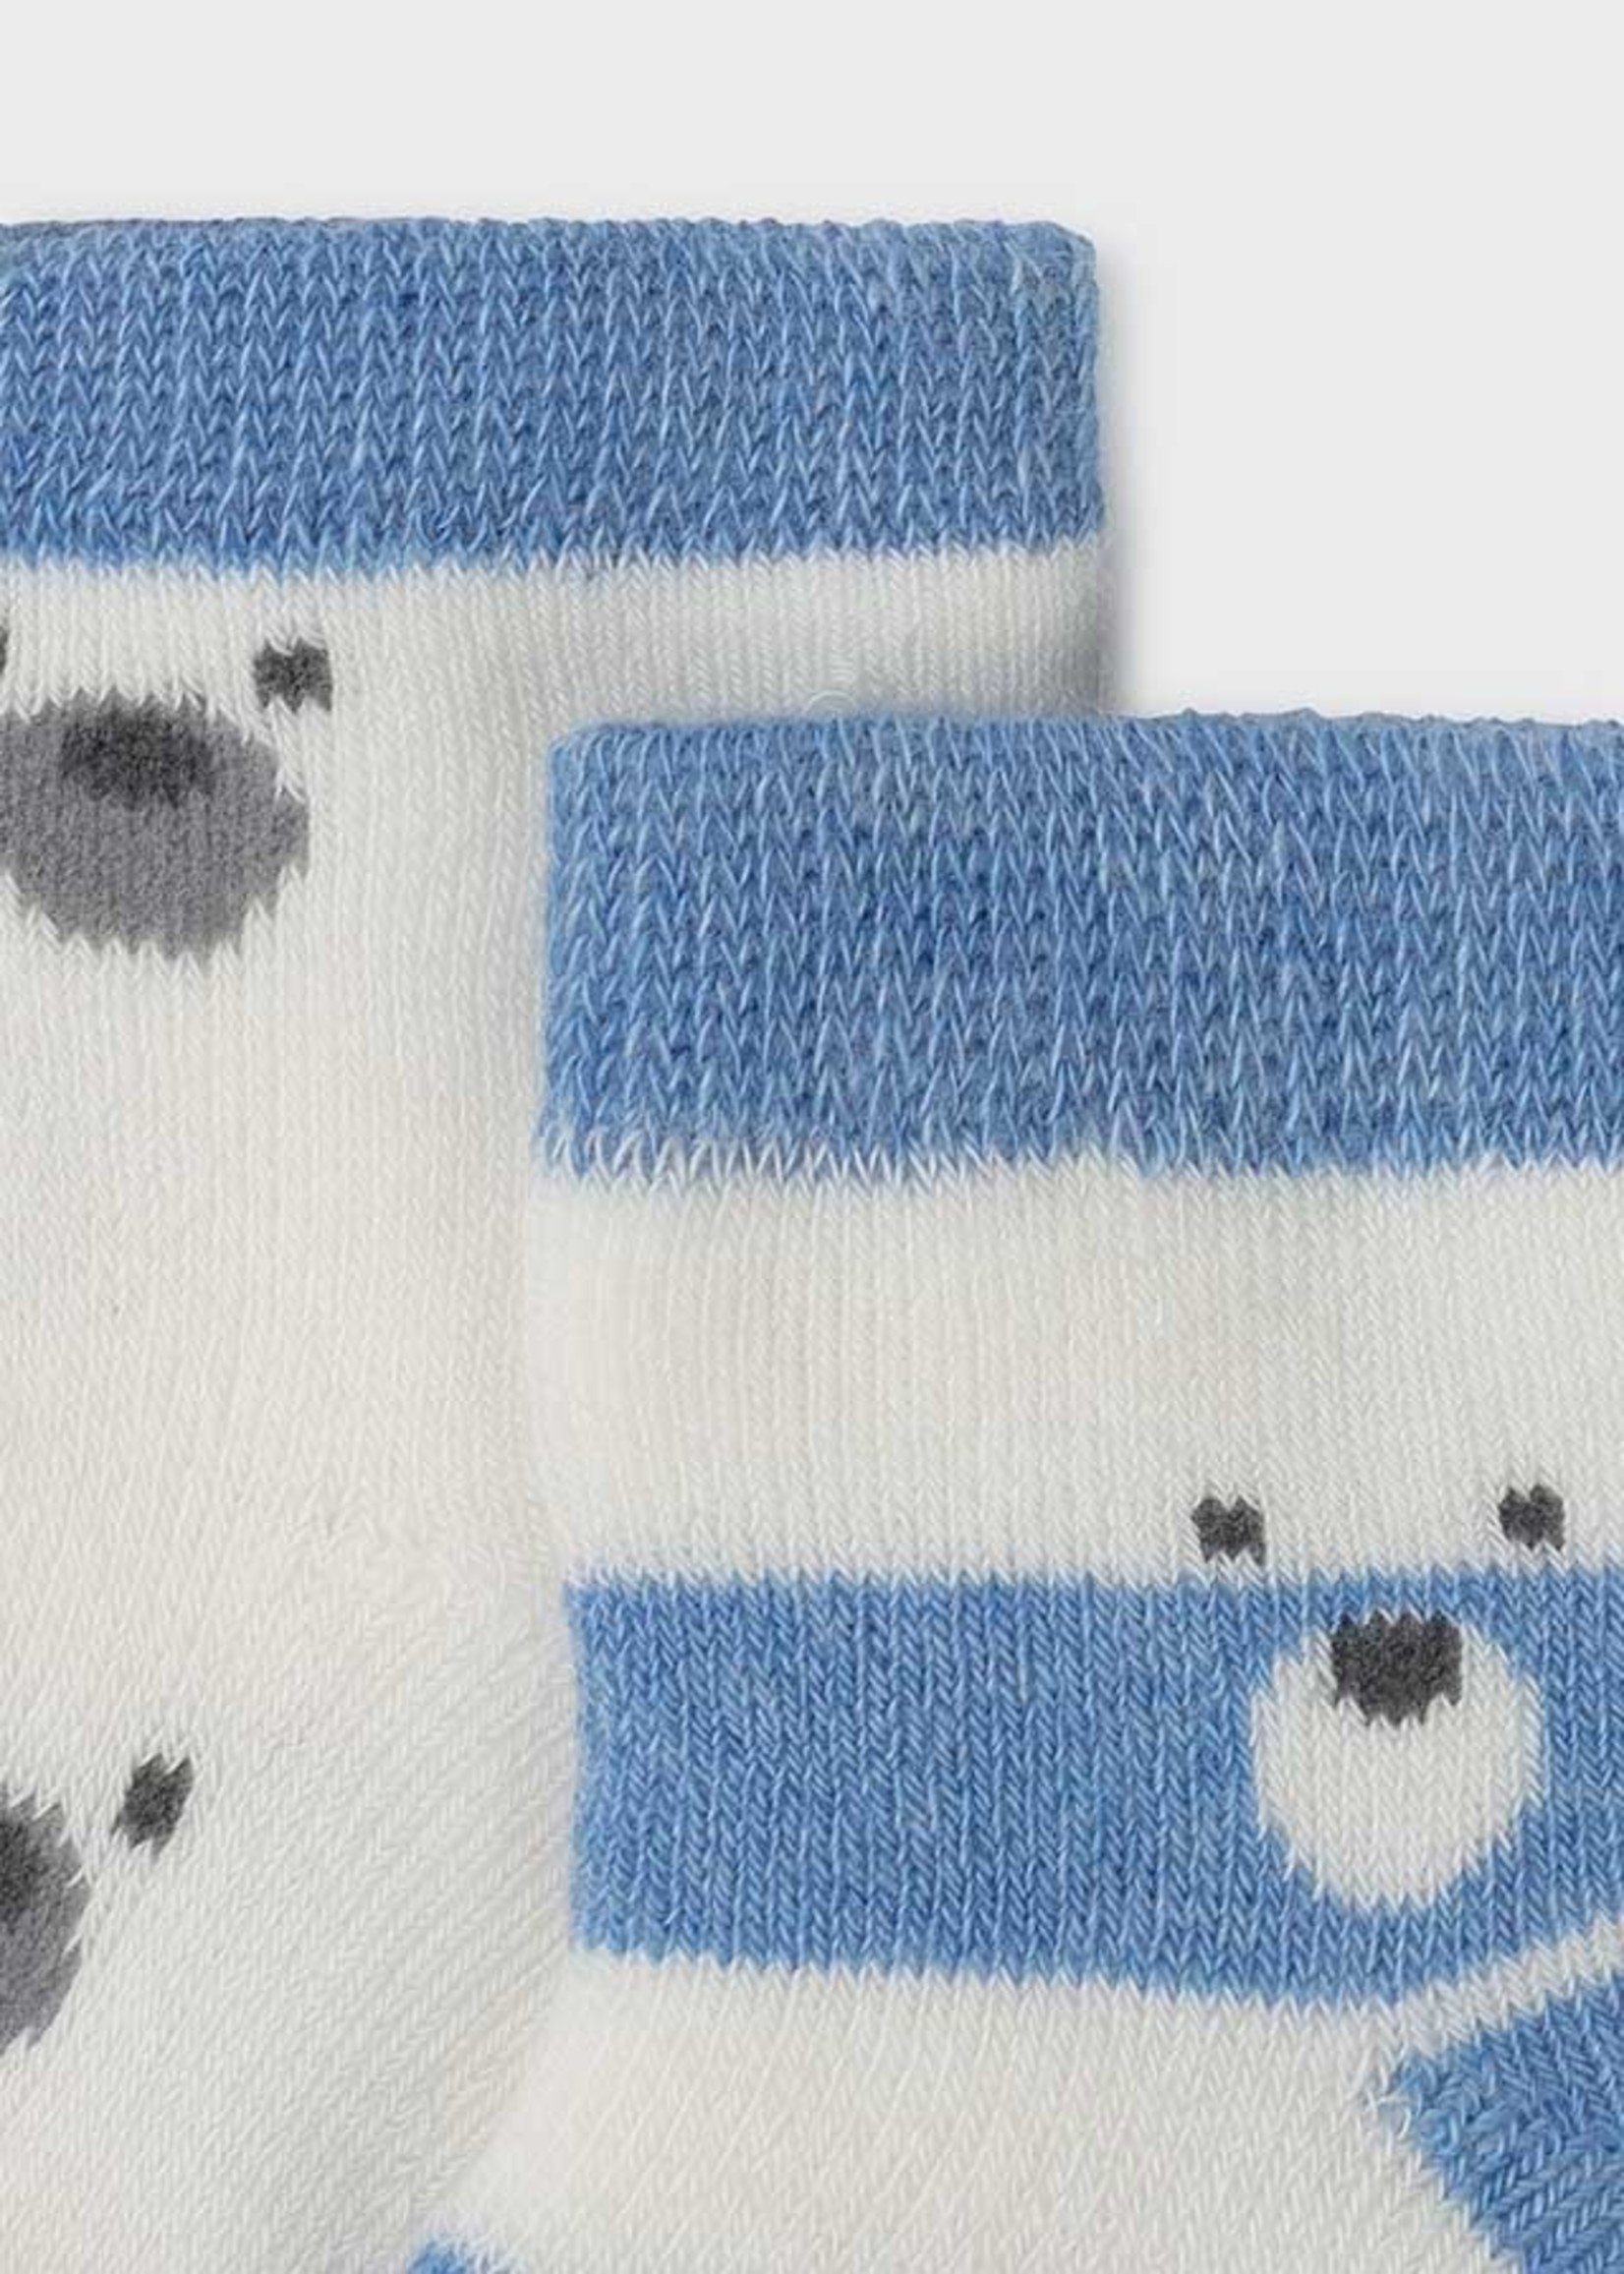 MAYORAL MAYORAL Sokjes 4 stuks blauw